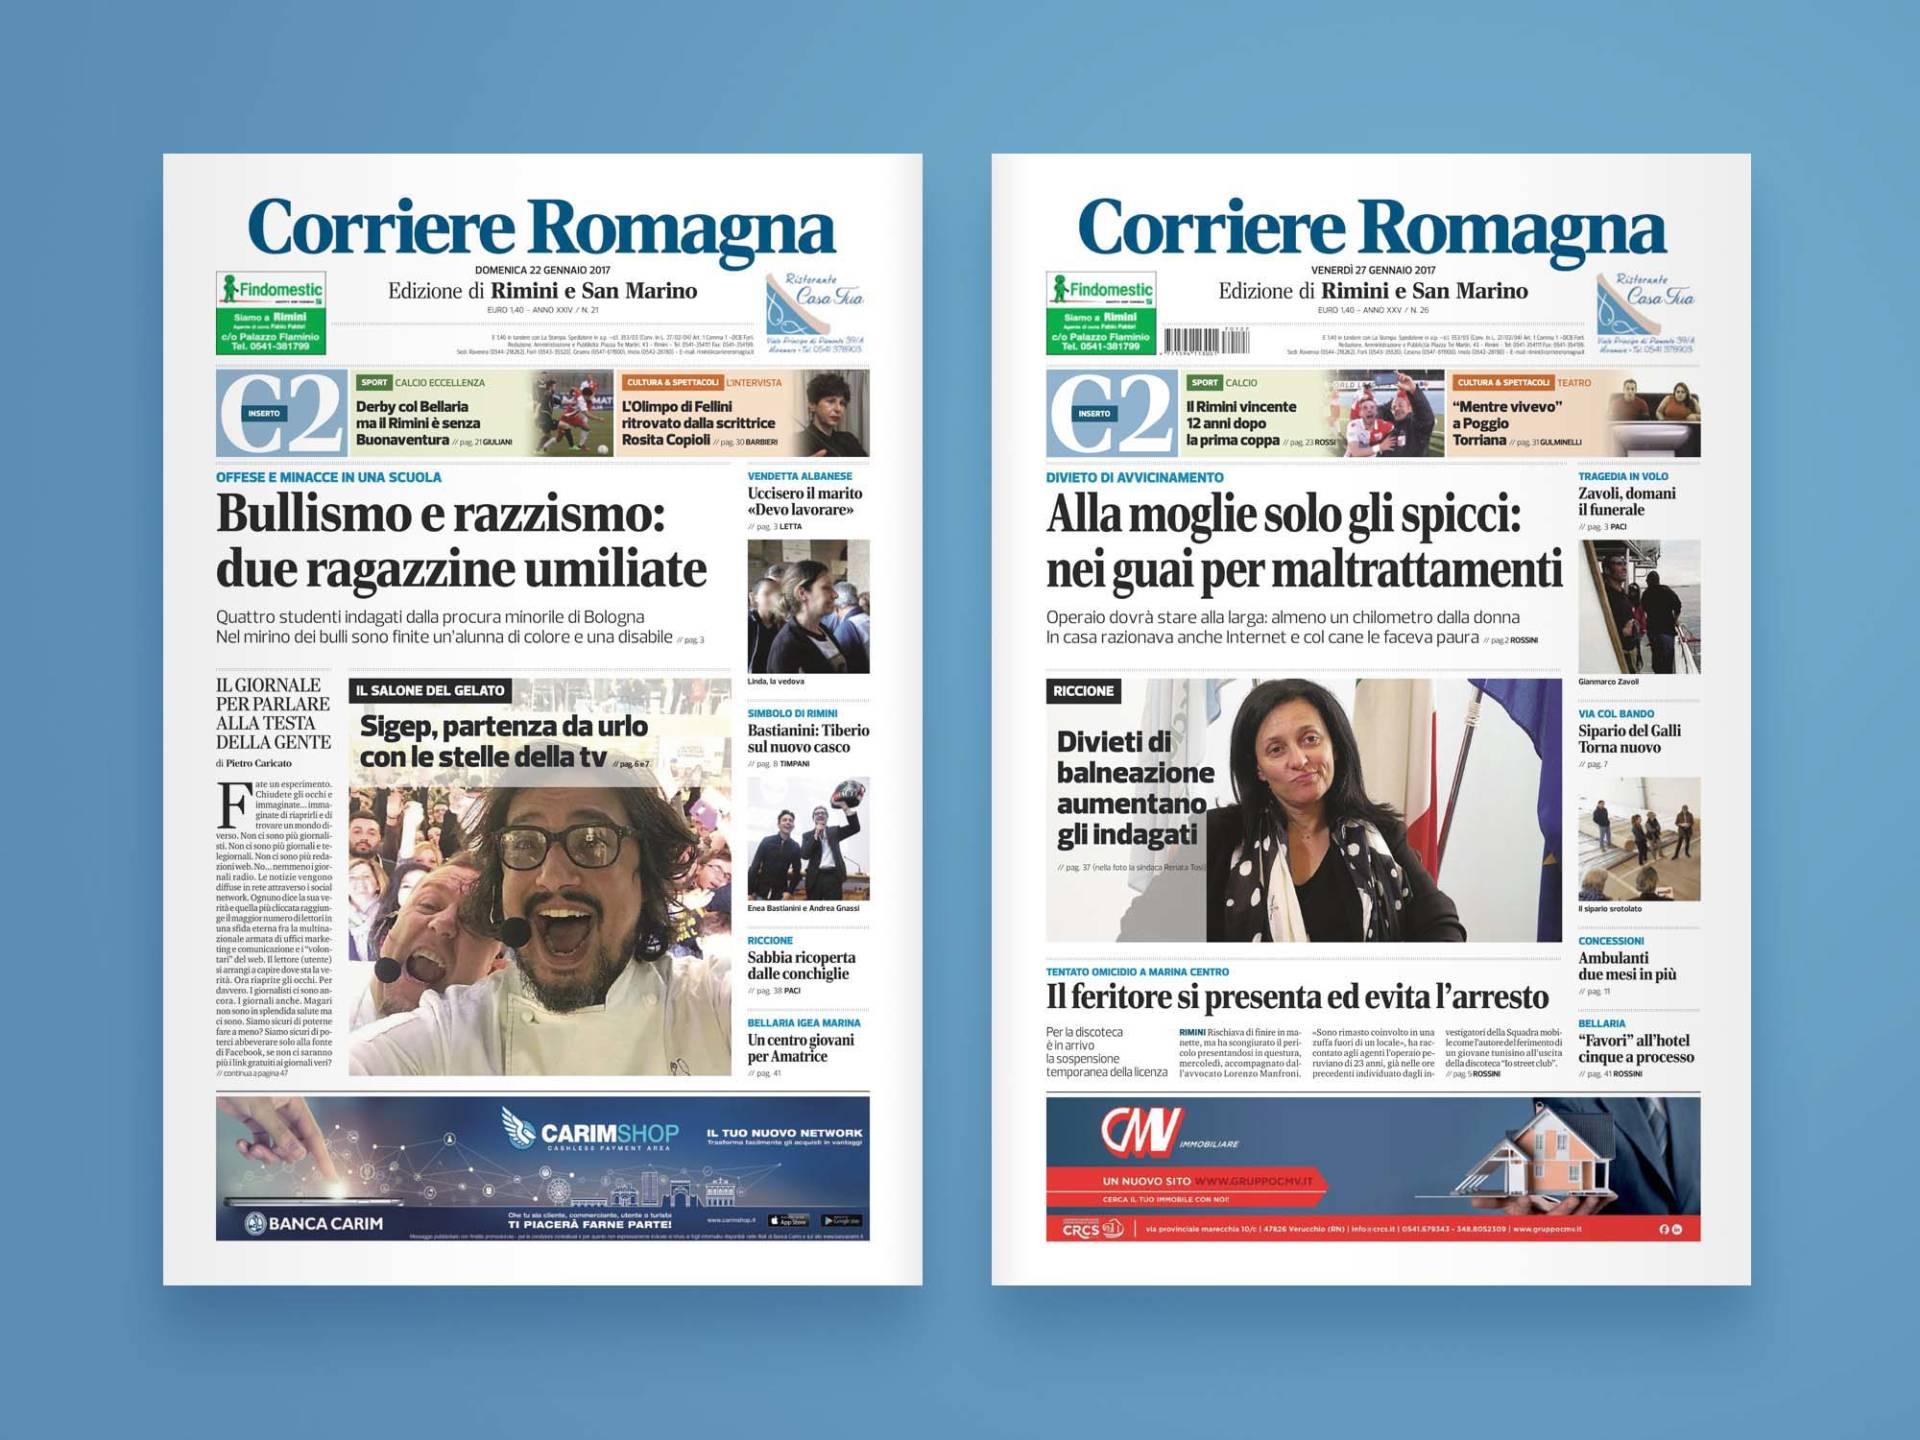 Corriere_Romagna_06_Wenceslau_News_Design